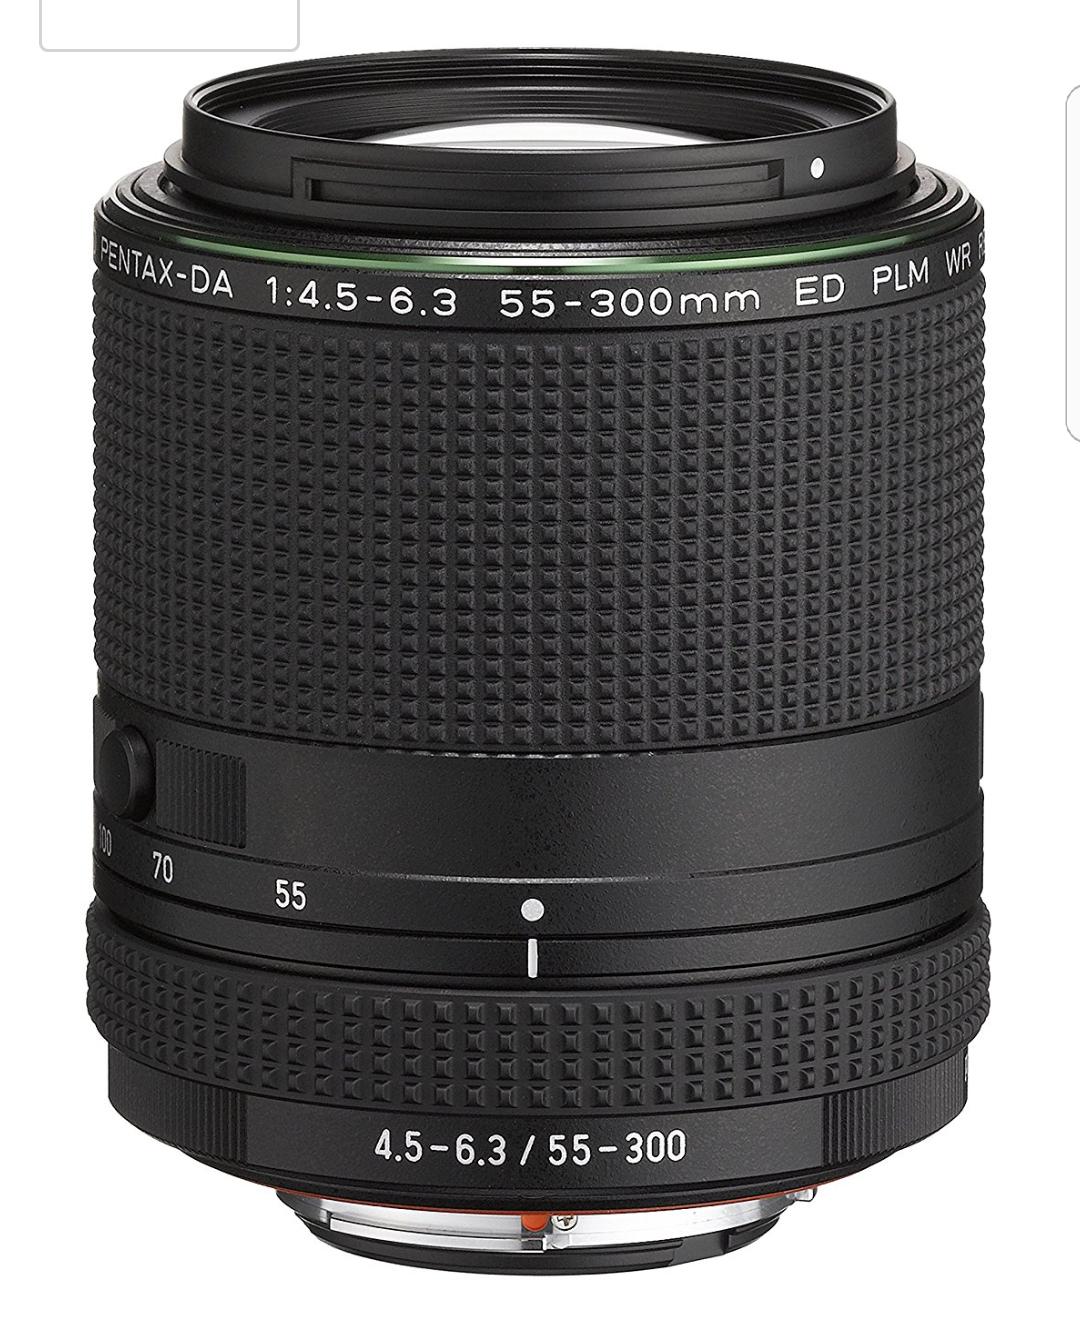 [Amazon] Pentax HD DA 55-300mm F4.5-6.3 ED PLM WR RE Objektiv schwarz